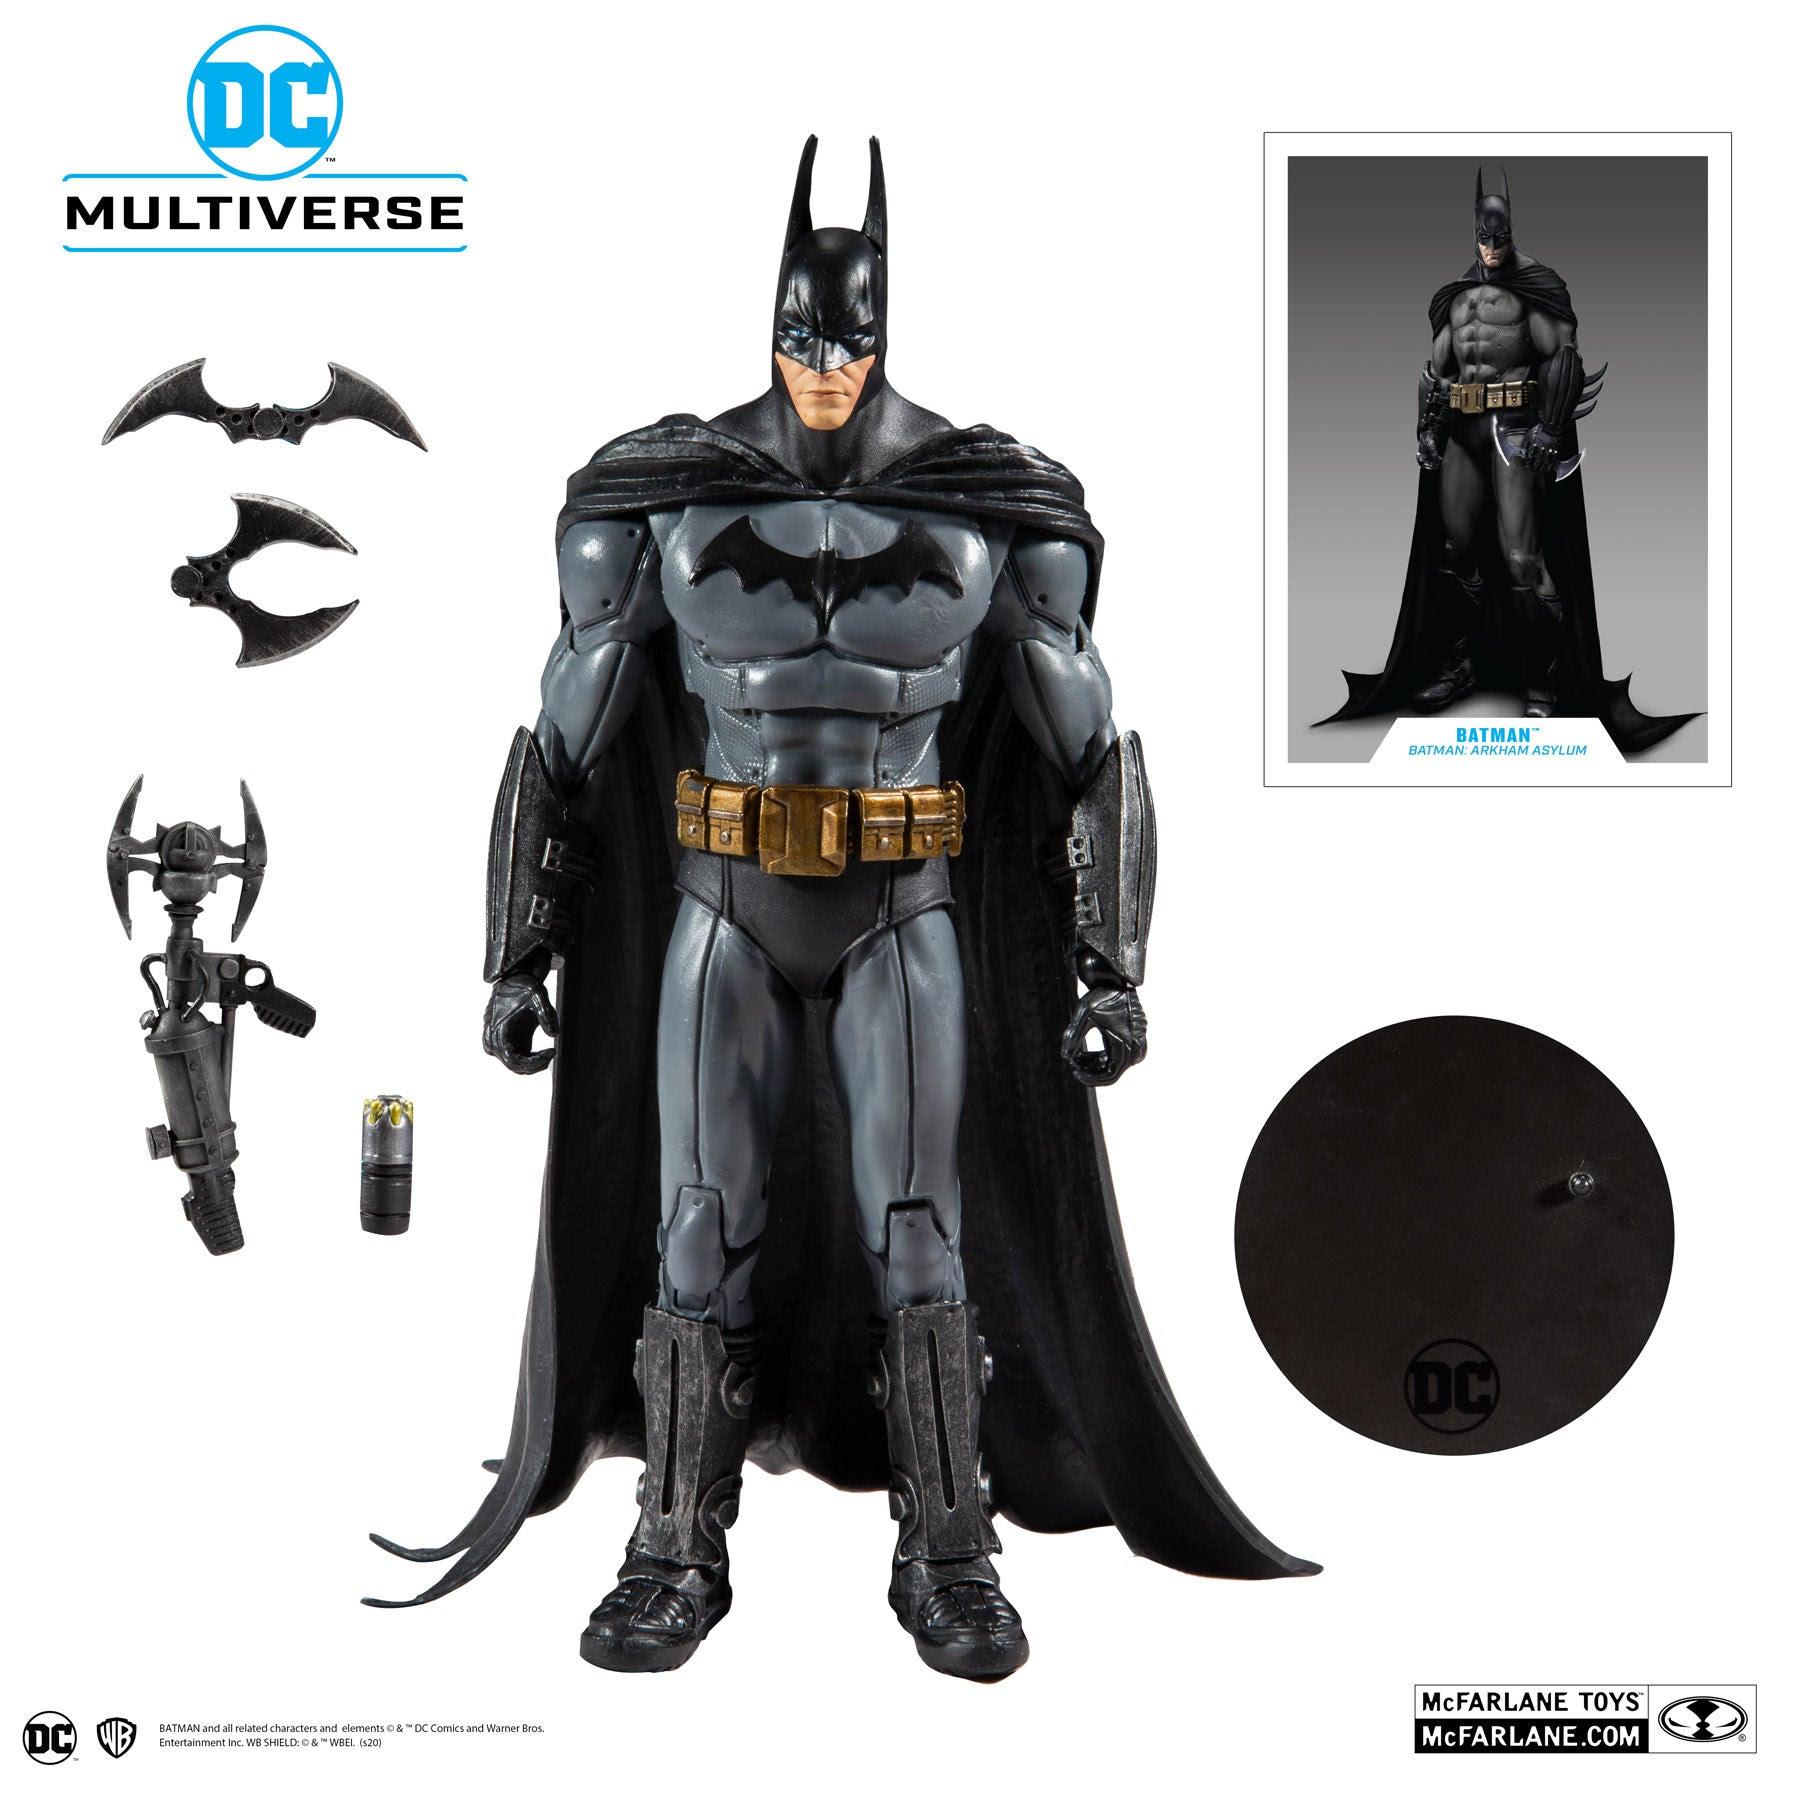 Image of DC Multiverse - Batman (Batman: Arkham Asylum)